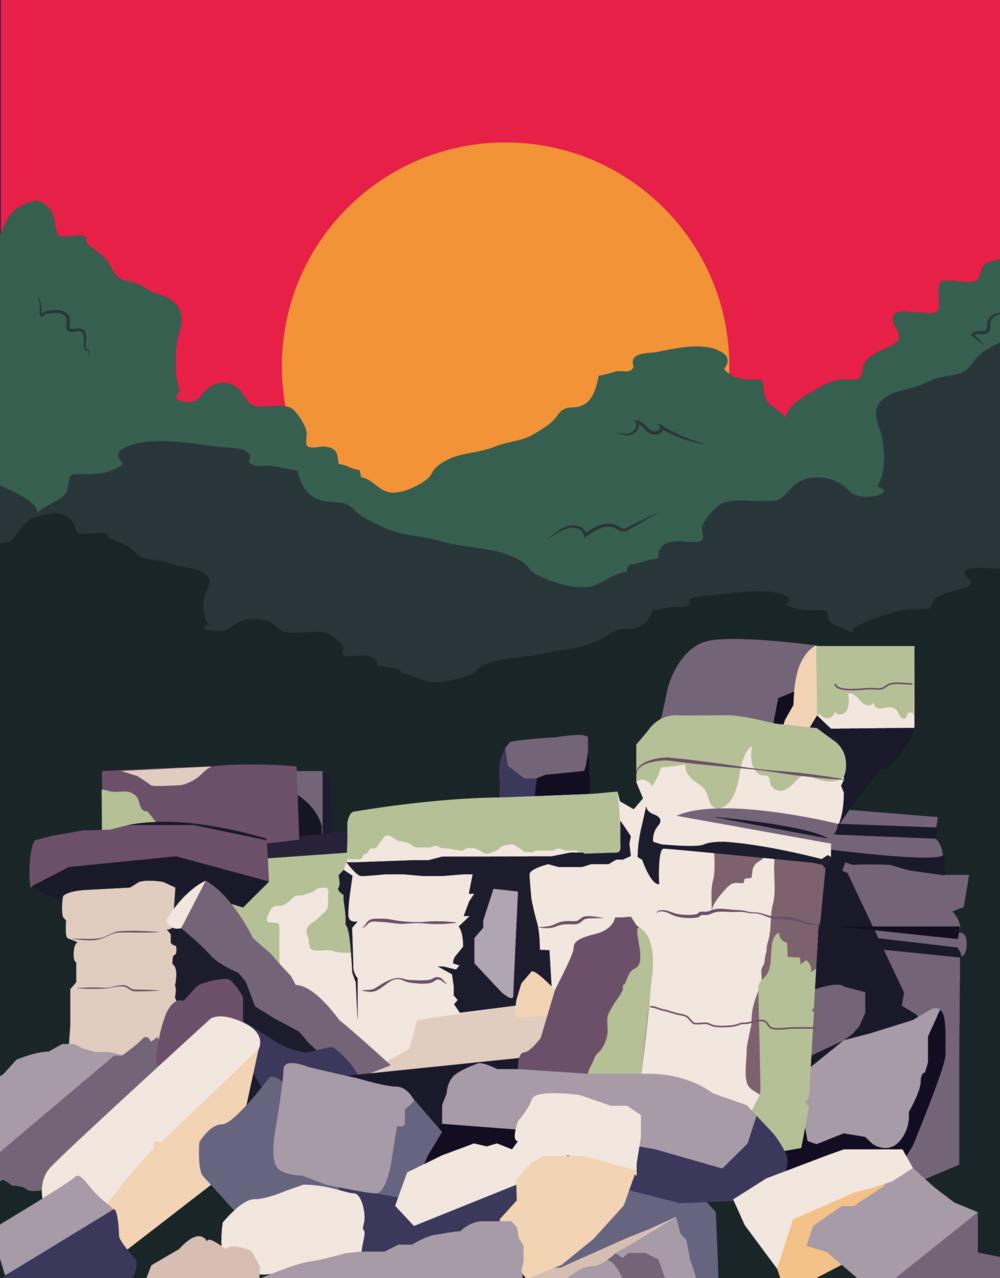 june illustrations-01.png